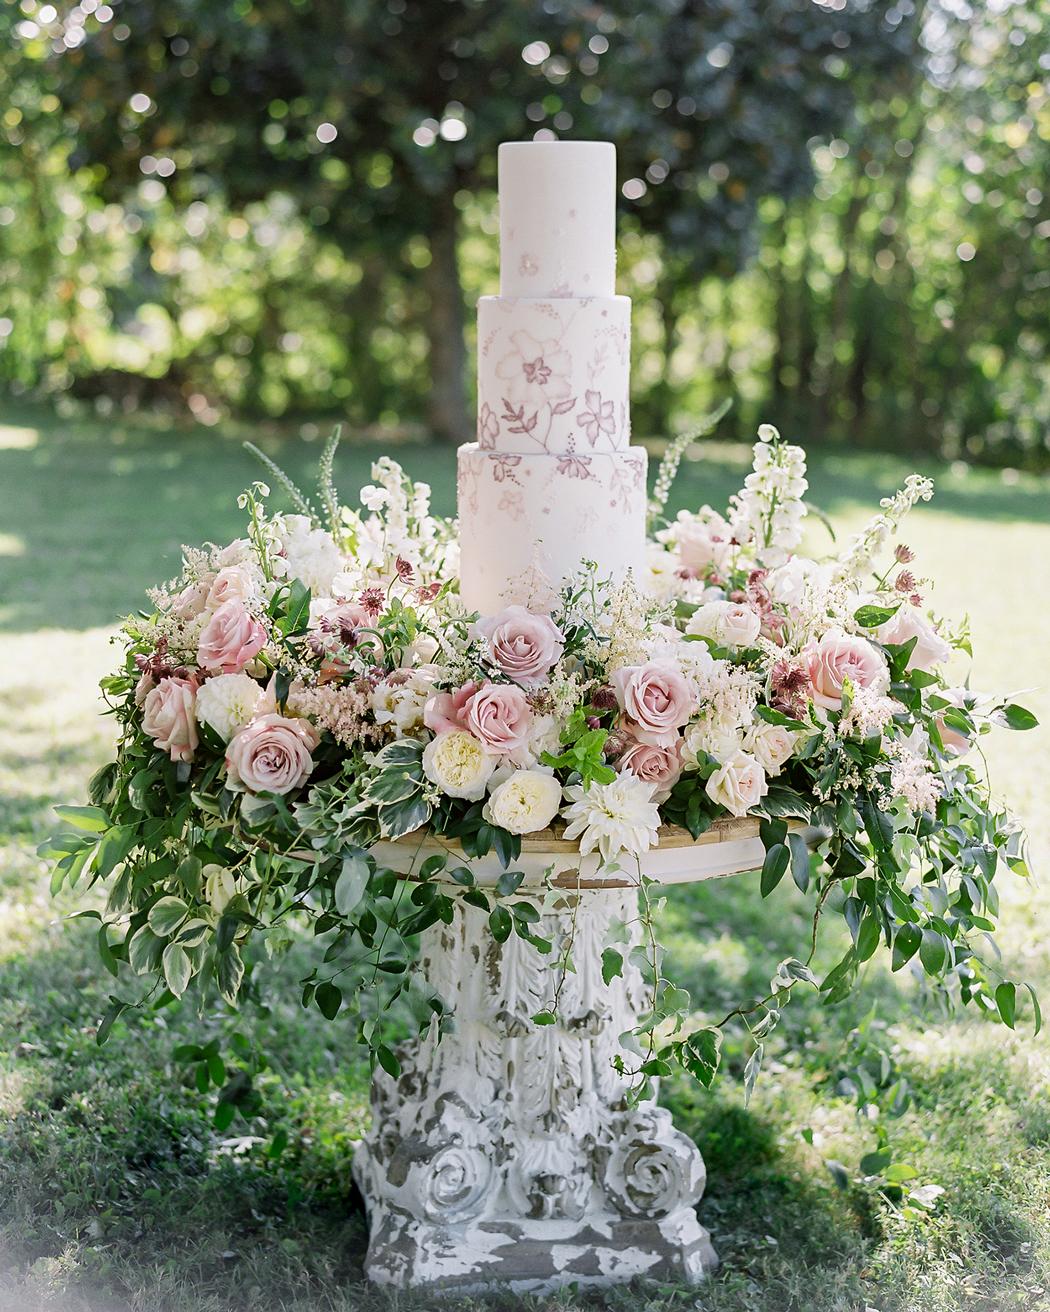 floral-filled cake and dessert display